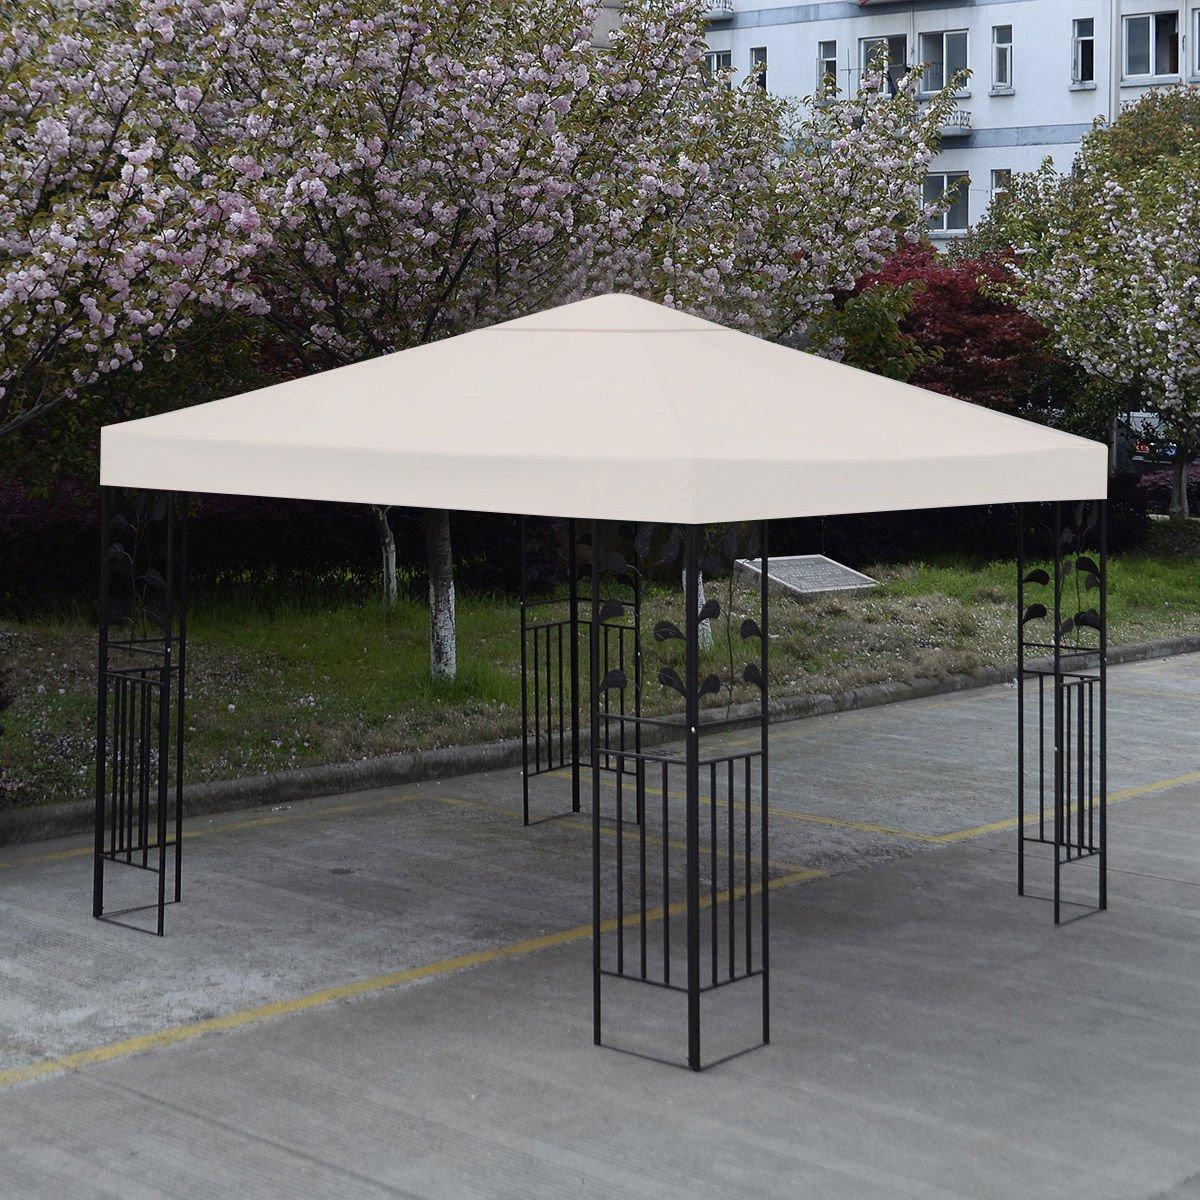 New 10u0027 X 10u0027 Gazebo Top Cover Patio Canopy Replacement 1 Tier Beige